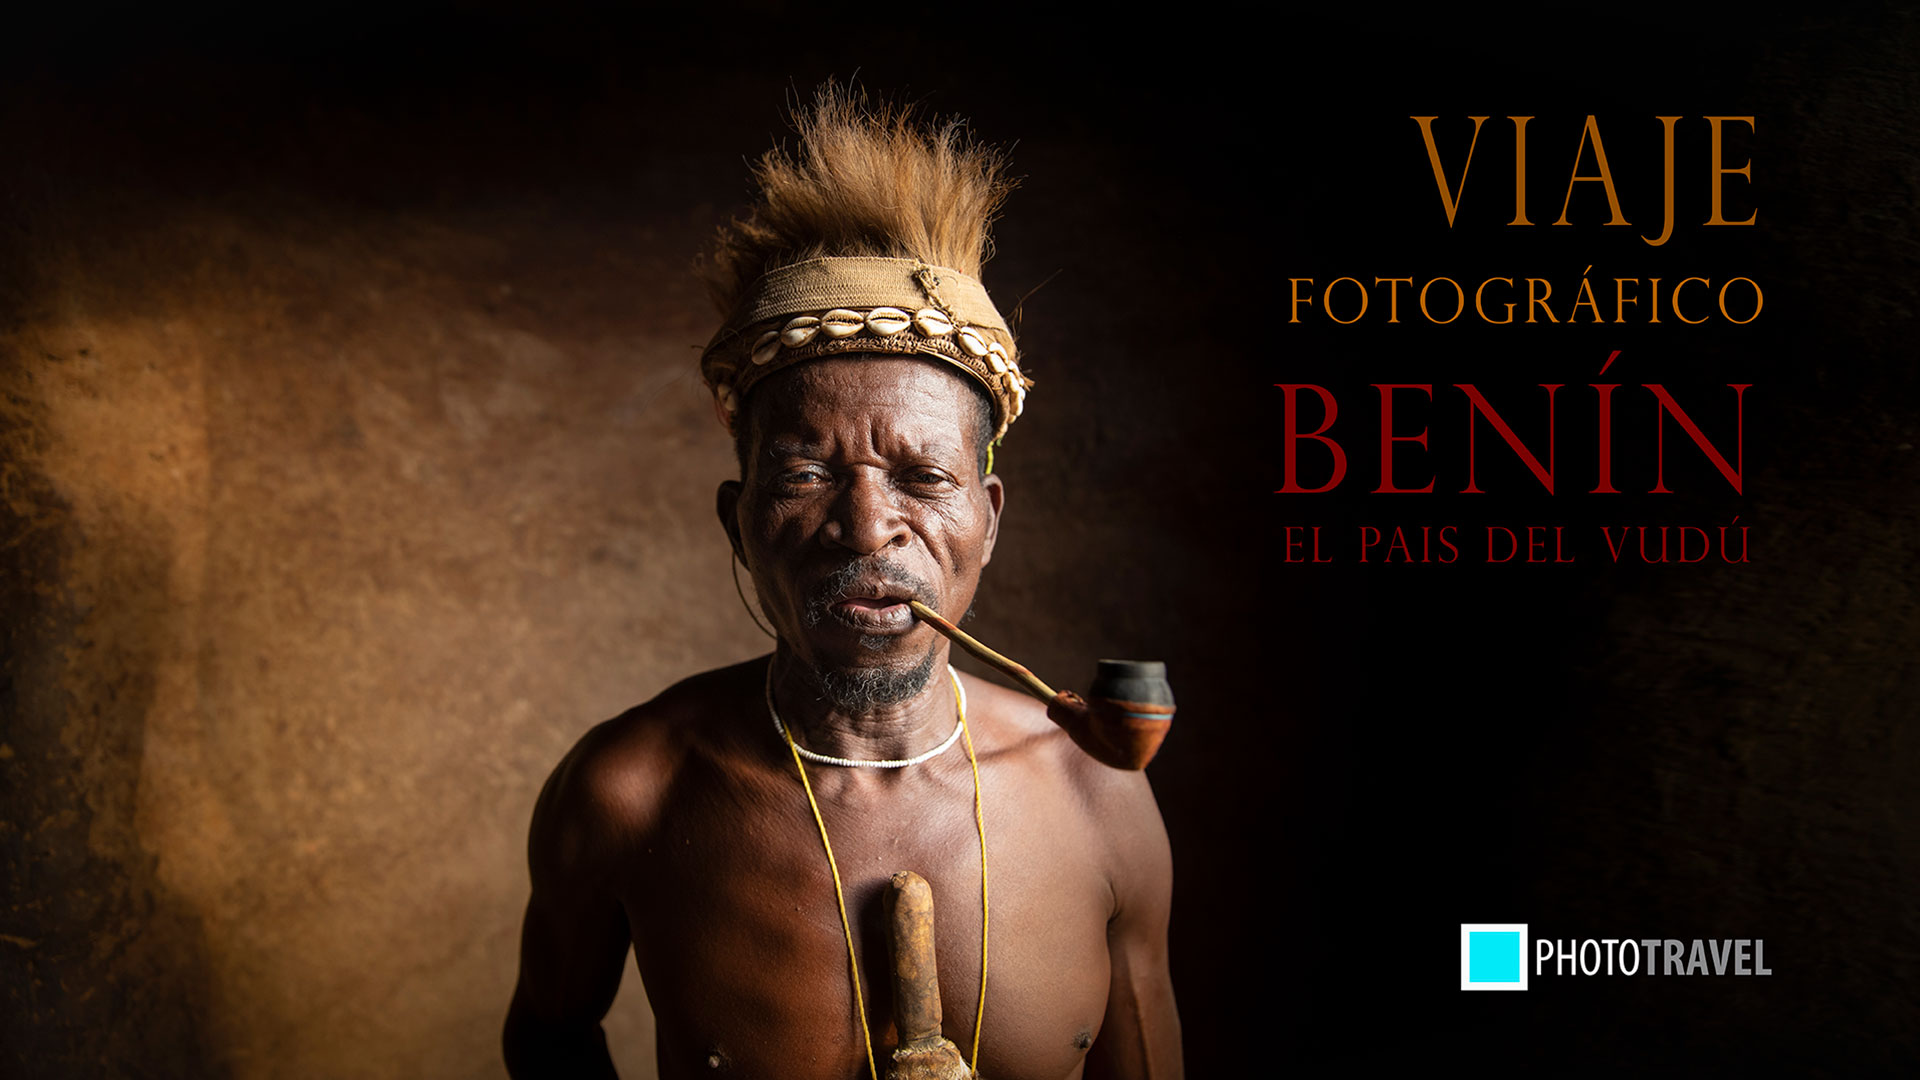 viaje-fotografico-benin